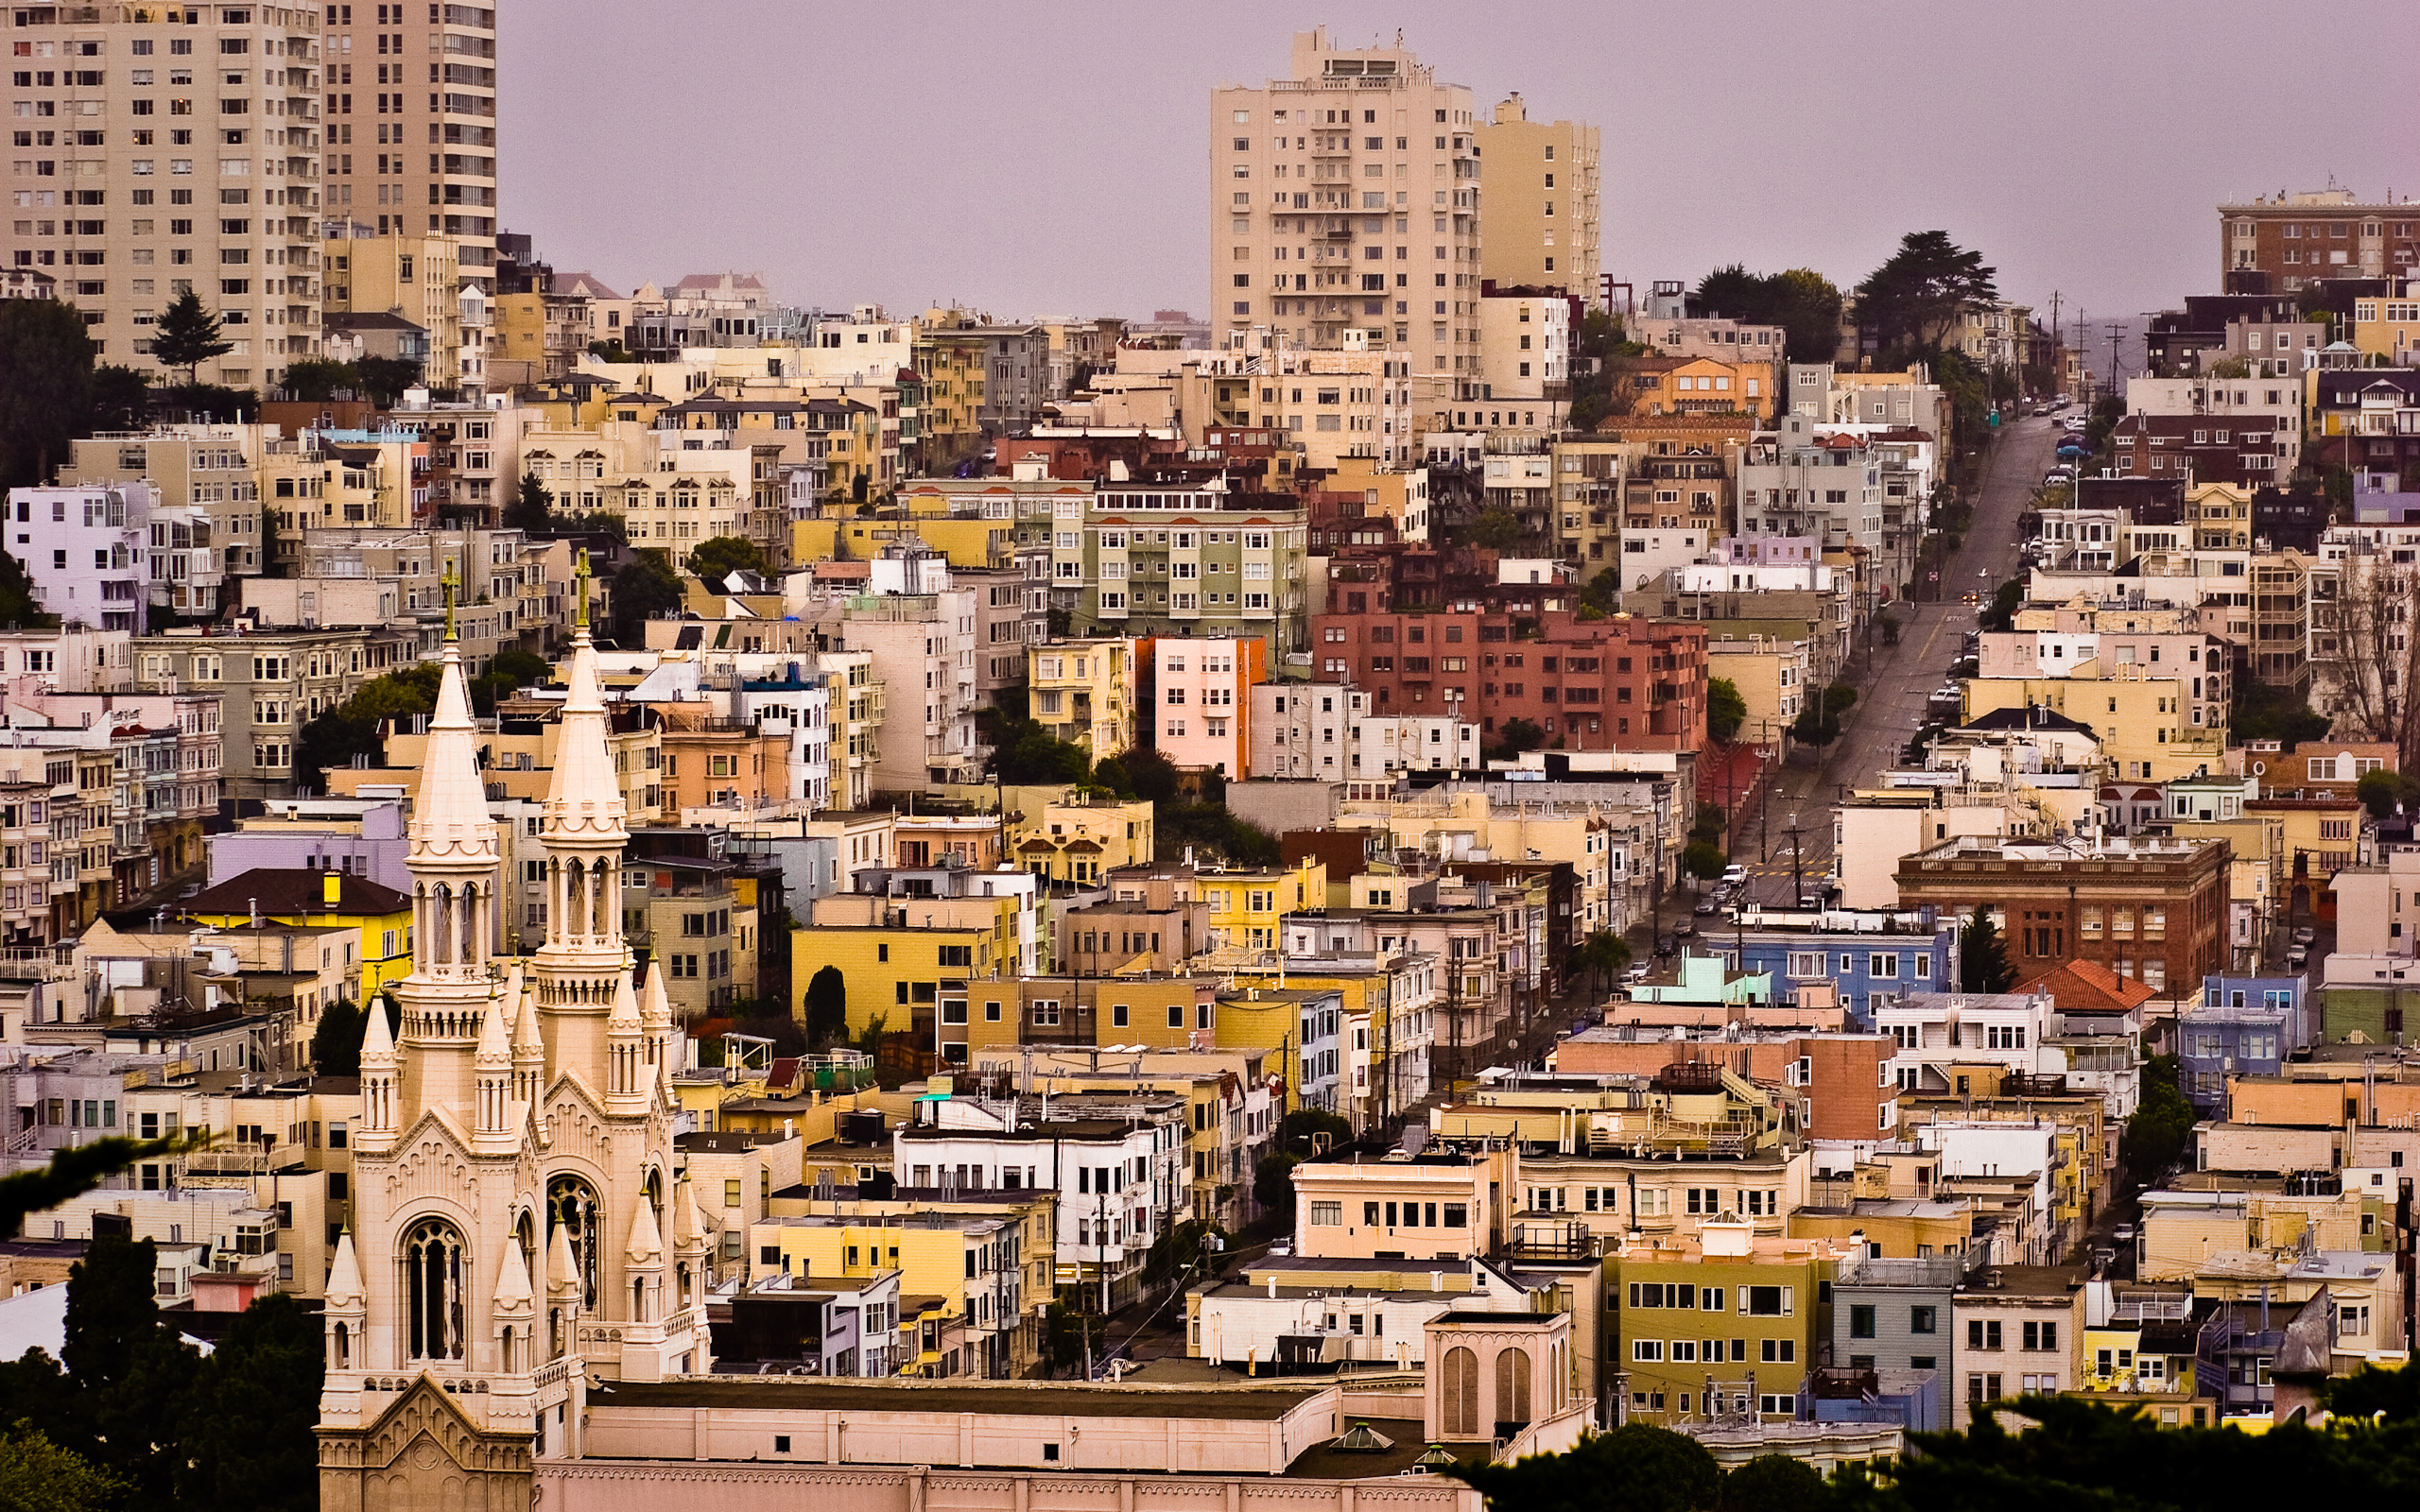 San Francisco Streets Wallpaper Hd